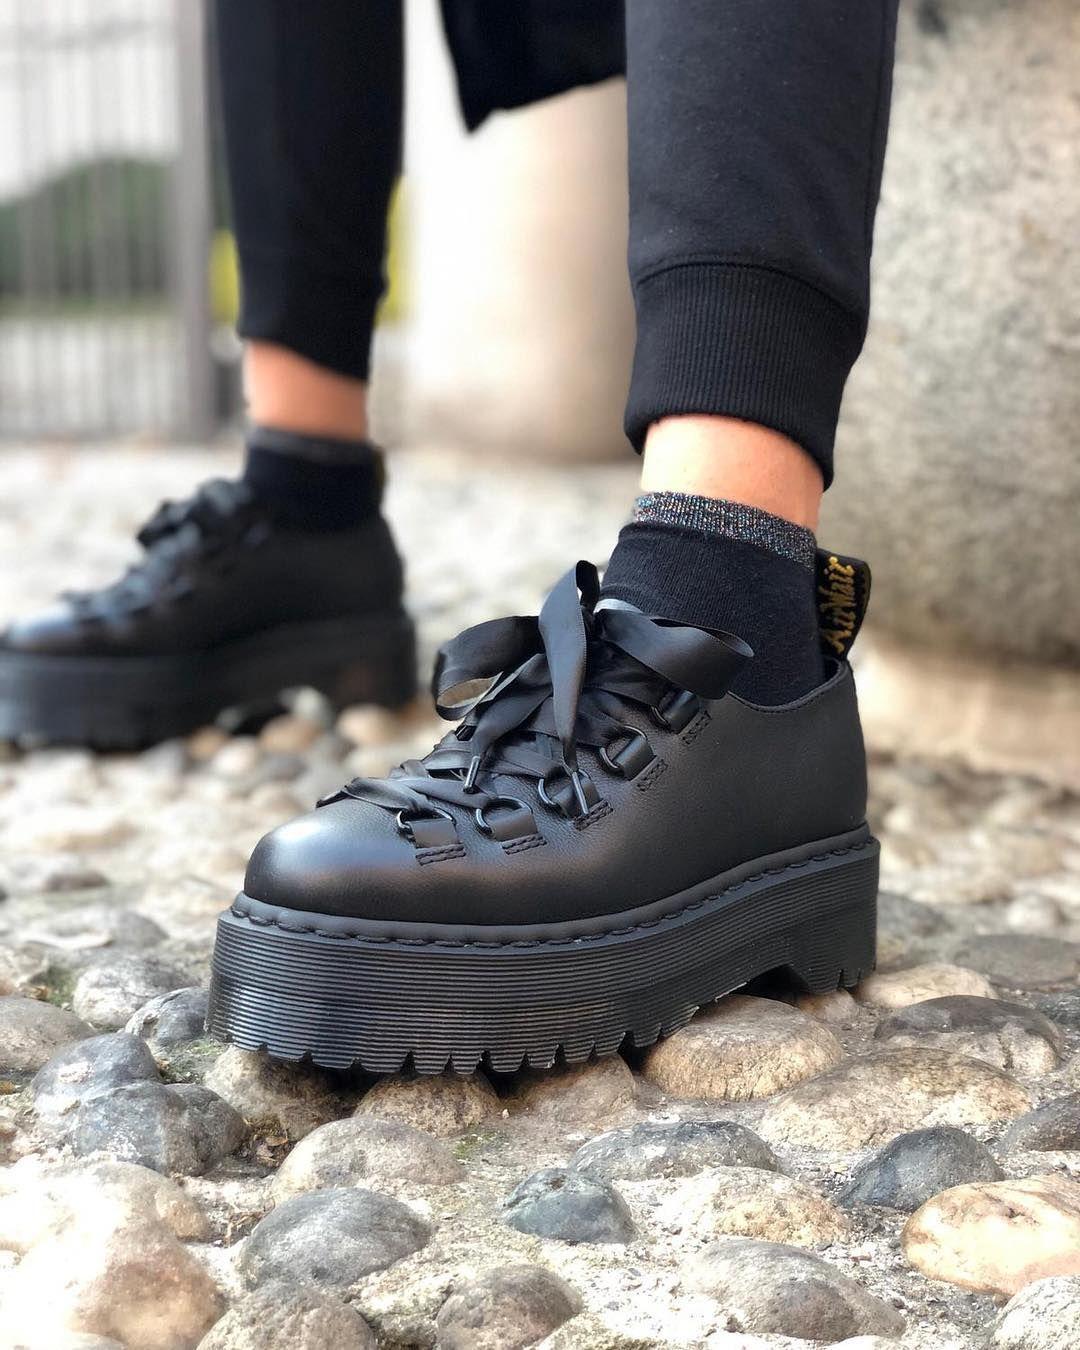 d9972ea0ebaa Dr. Martens | DR. MARTENS ☆ in 2019 | Sneakers, Platform sneakers ...